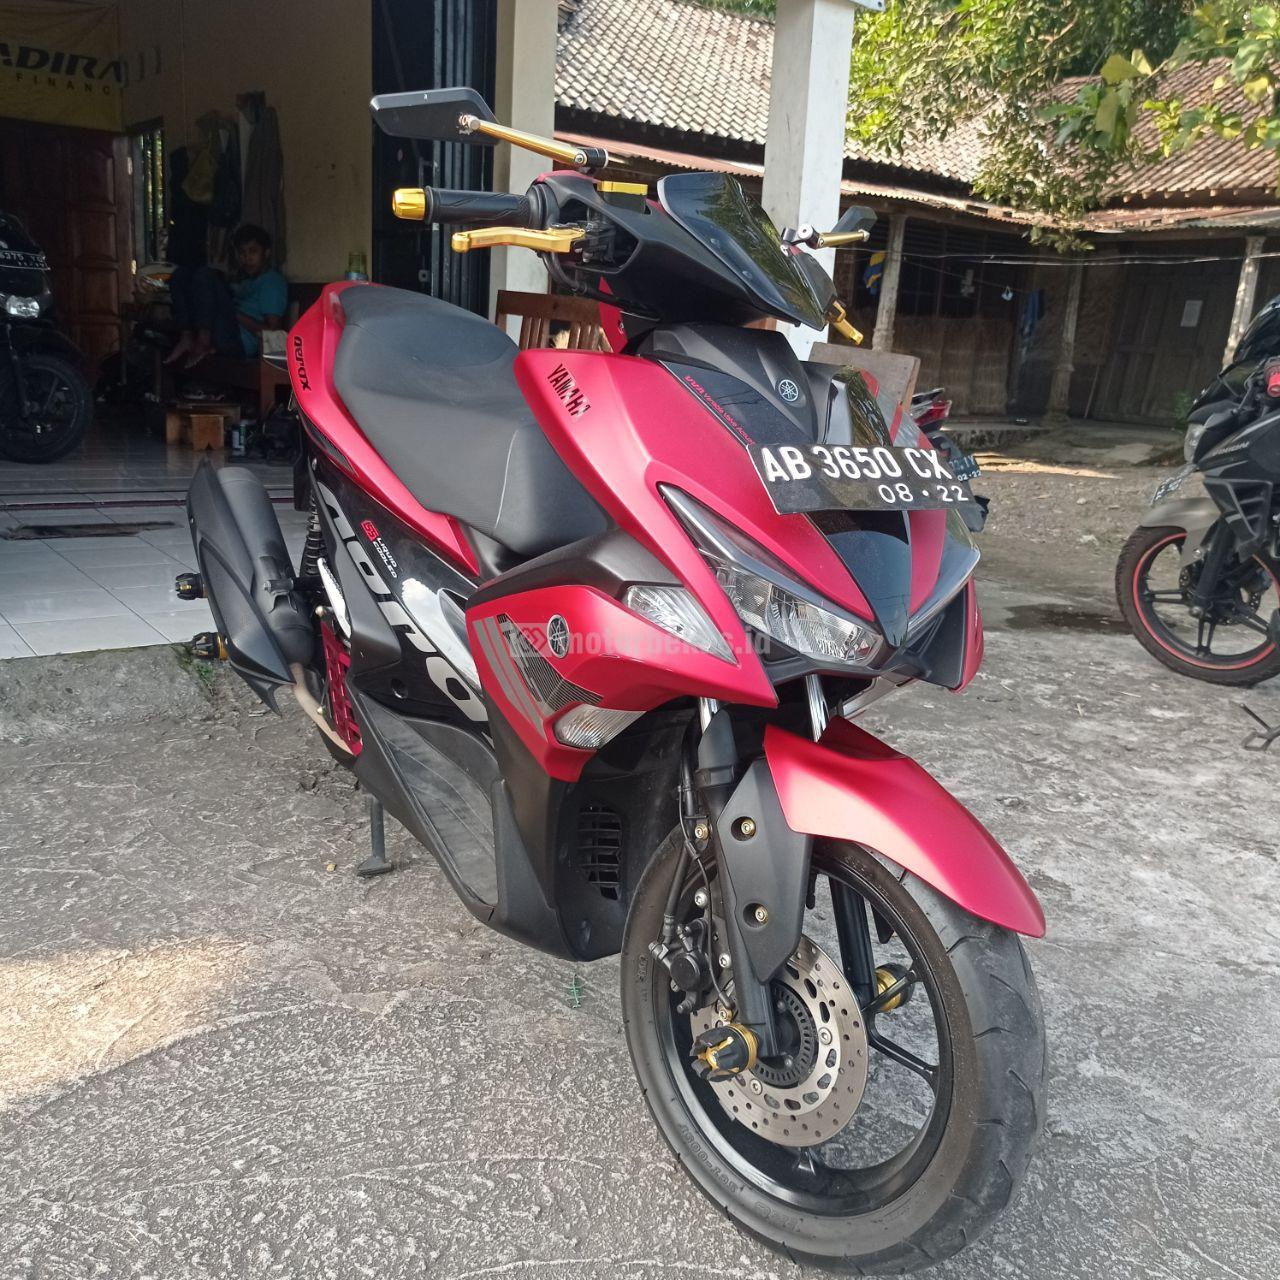 YAMAHA AEROX 155 VVA 691 motorbekas.id